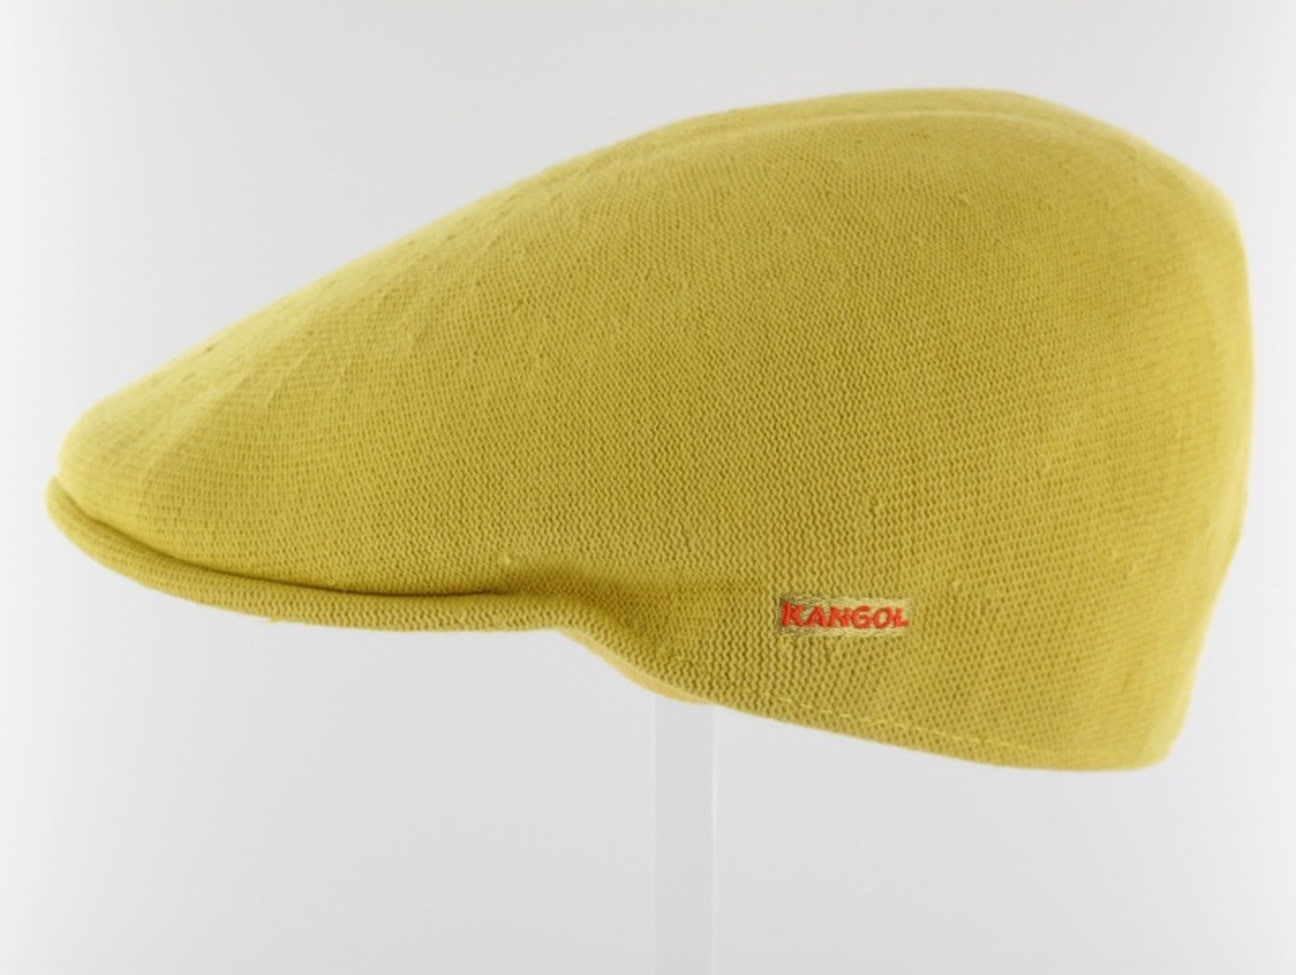 272bde09cdbc0 ... Gorra Gatsby Kangol Bambus 507 - amarillo 1 ...